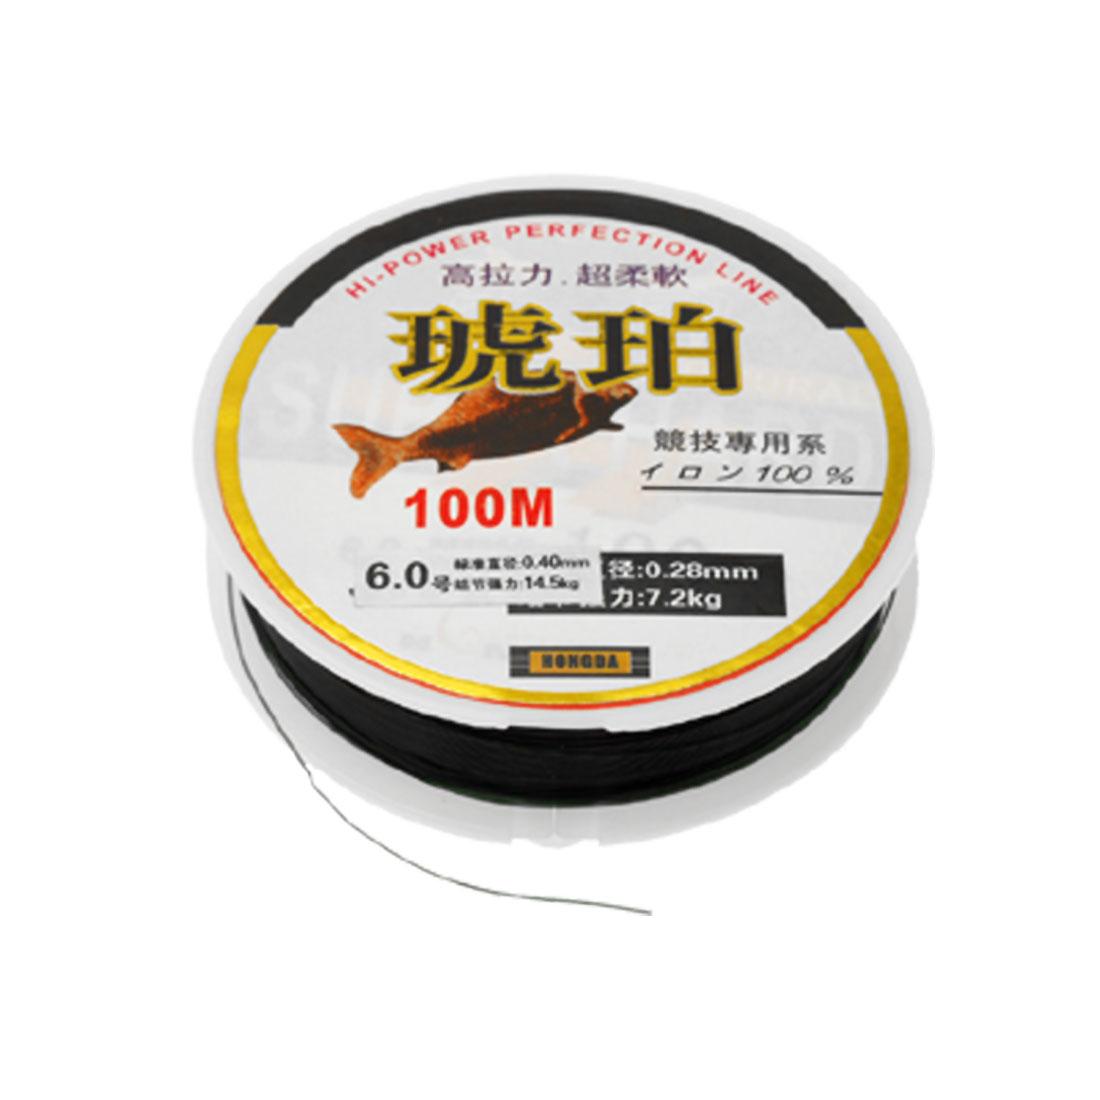 Black 100M Fishing Line Size 0.40mm 14.5Kg